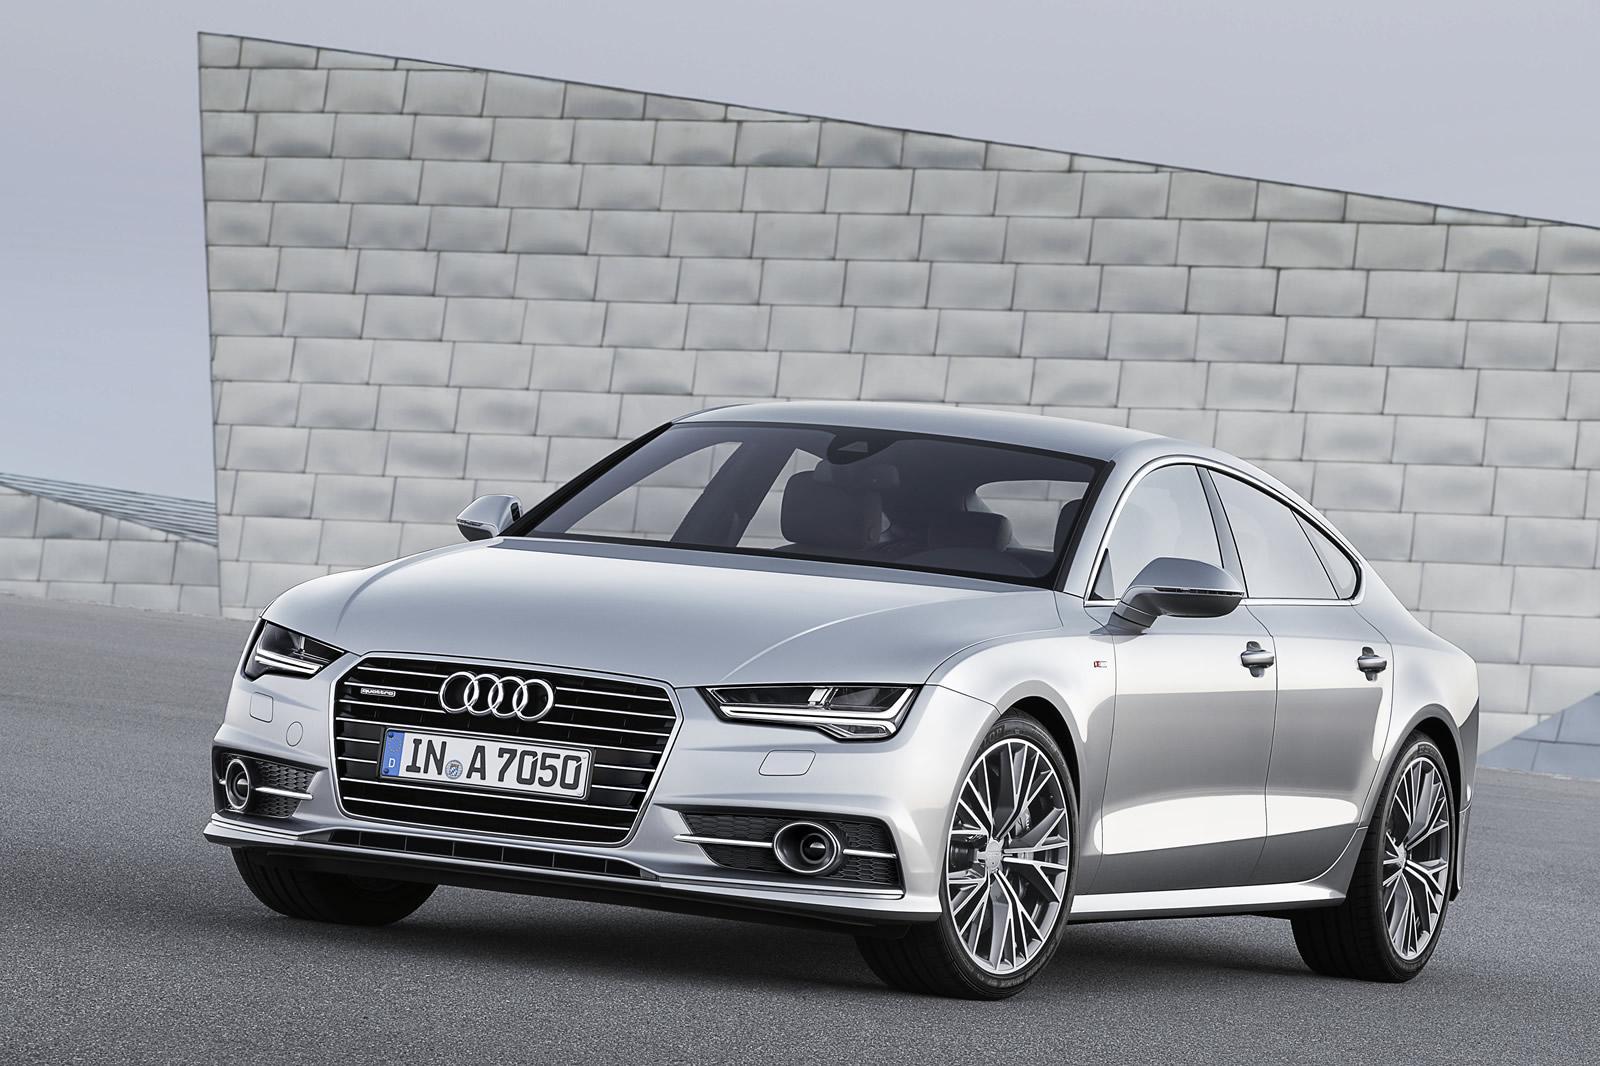 2015 Audi A7 & S7 Sportback Photos